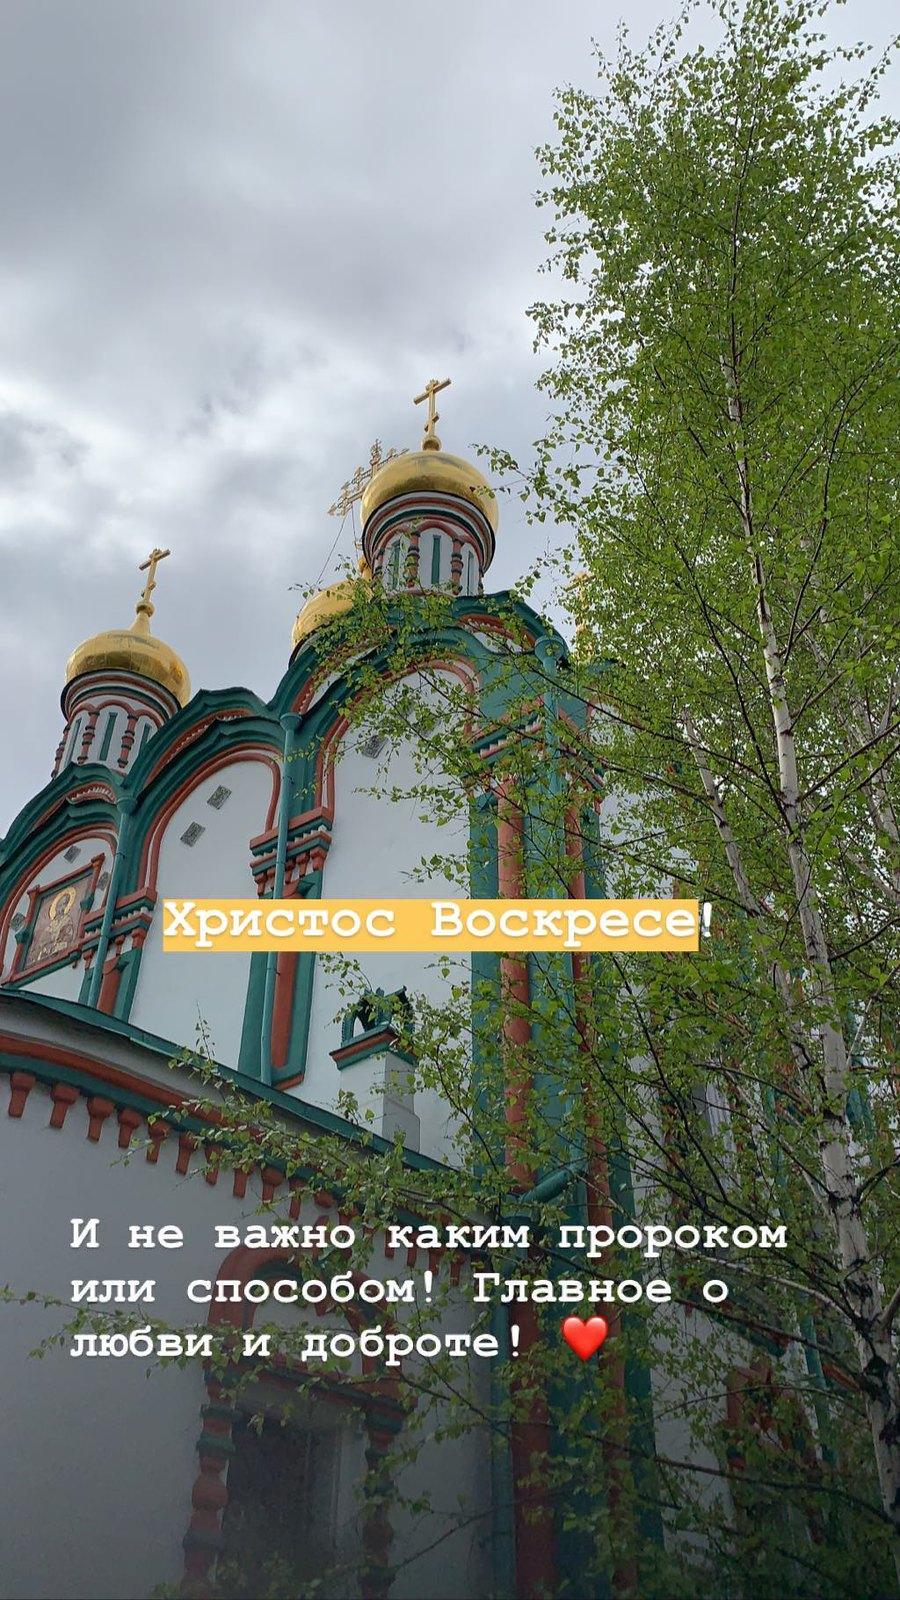 alina_astrovskaya_58701413_597444864094295_8992188892073384455_n